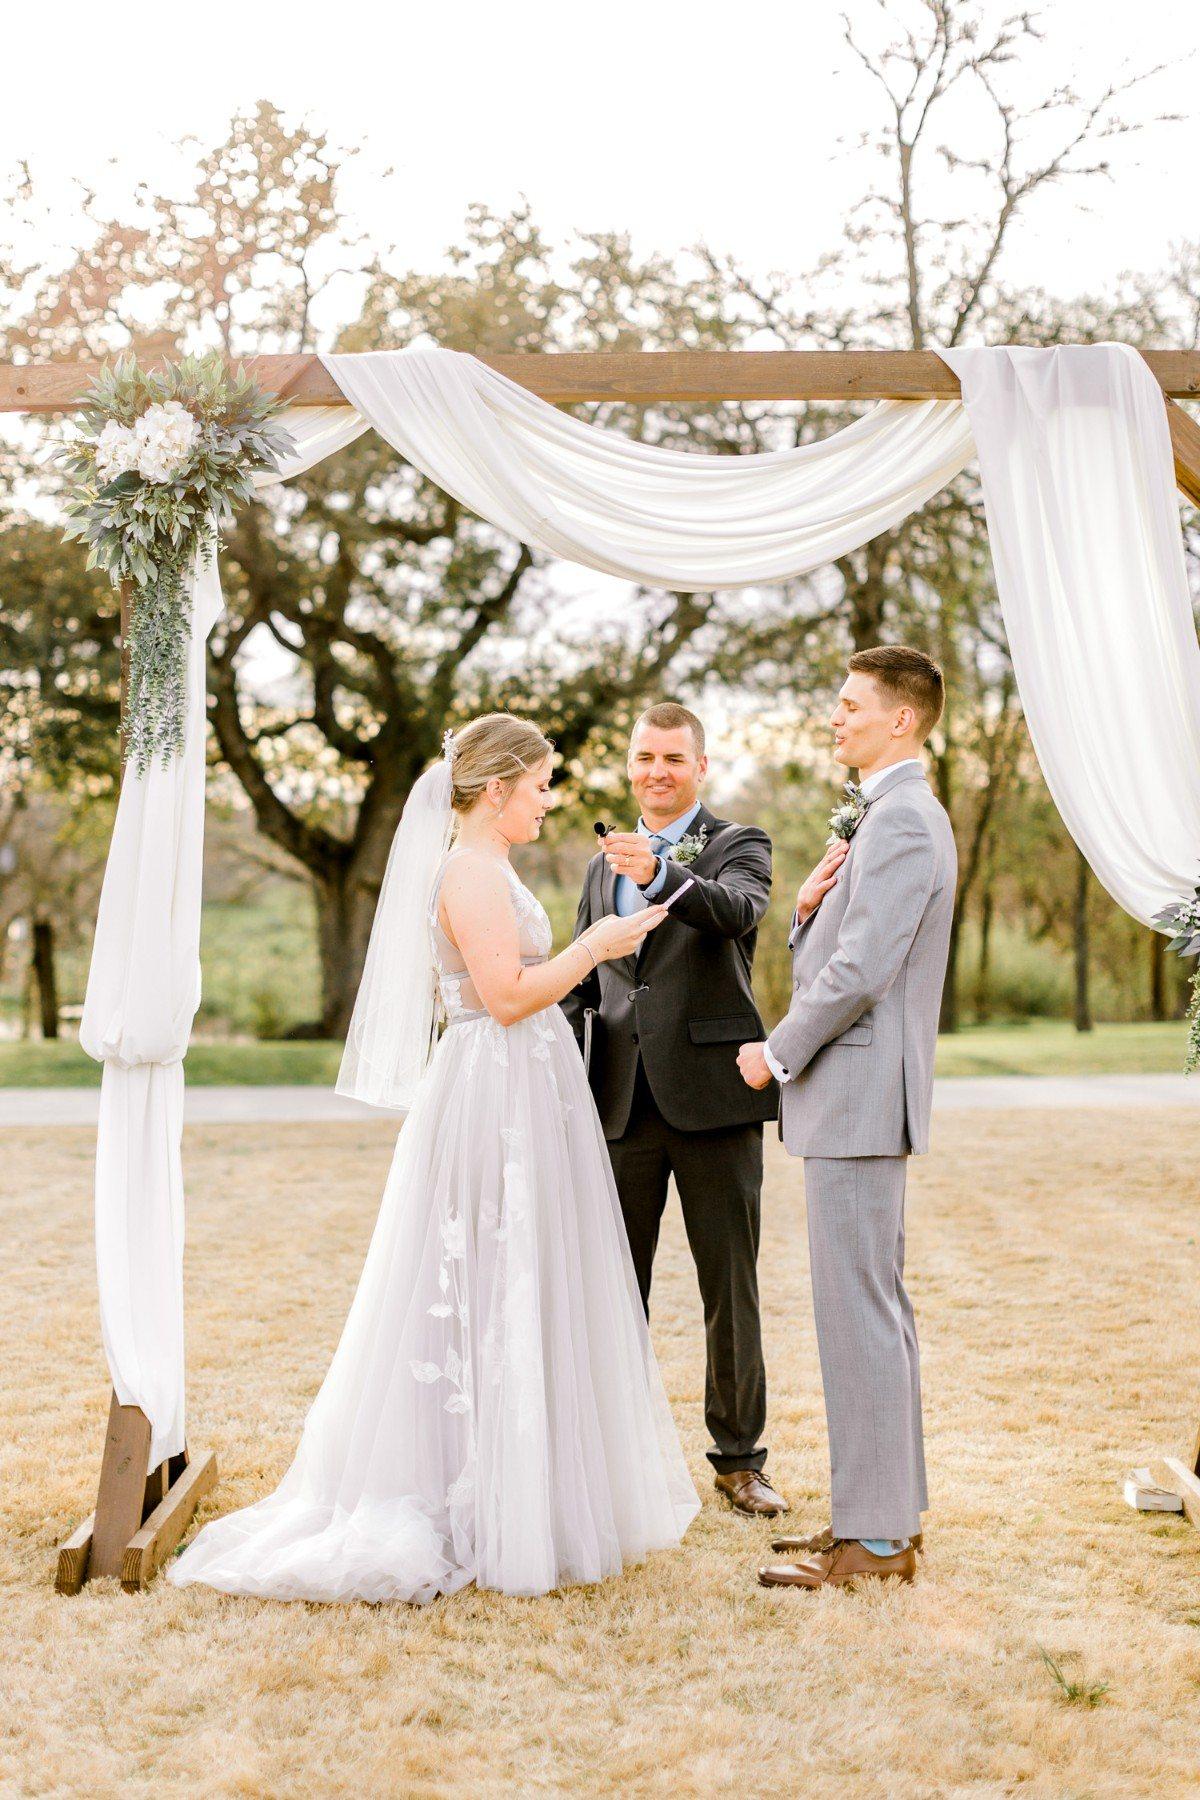 ennis-texas-wedding-photographer-kaitlyn-bullard-73.jpg